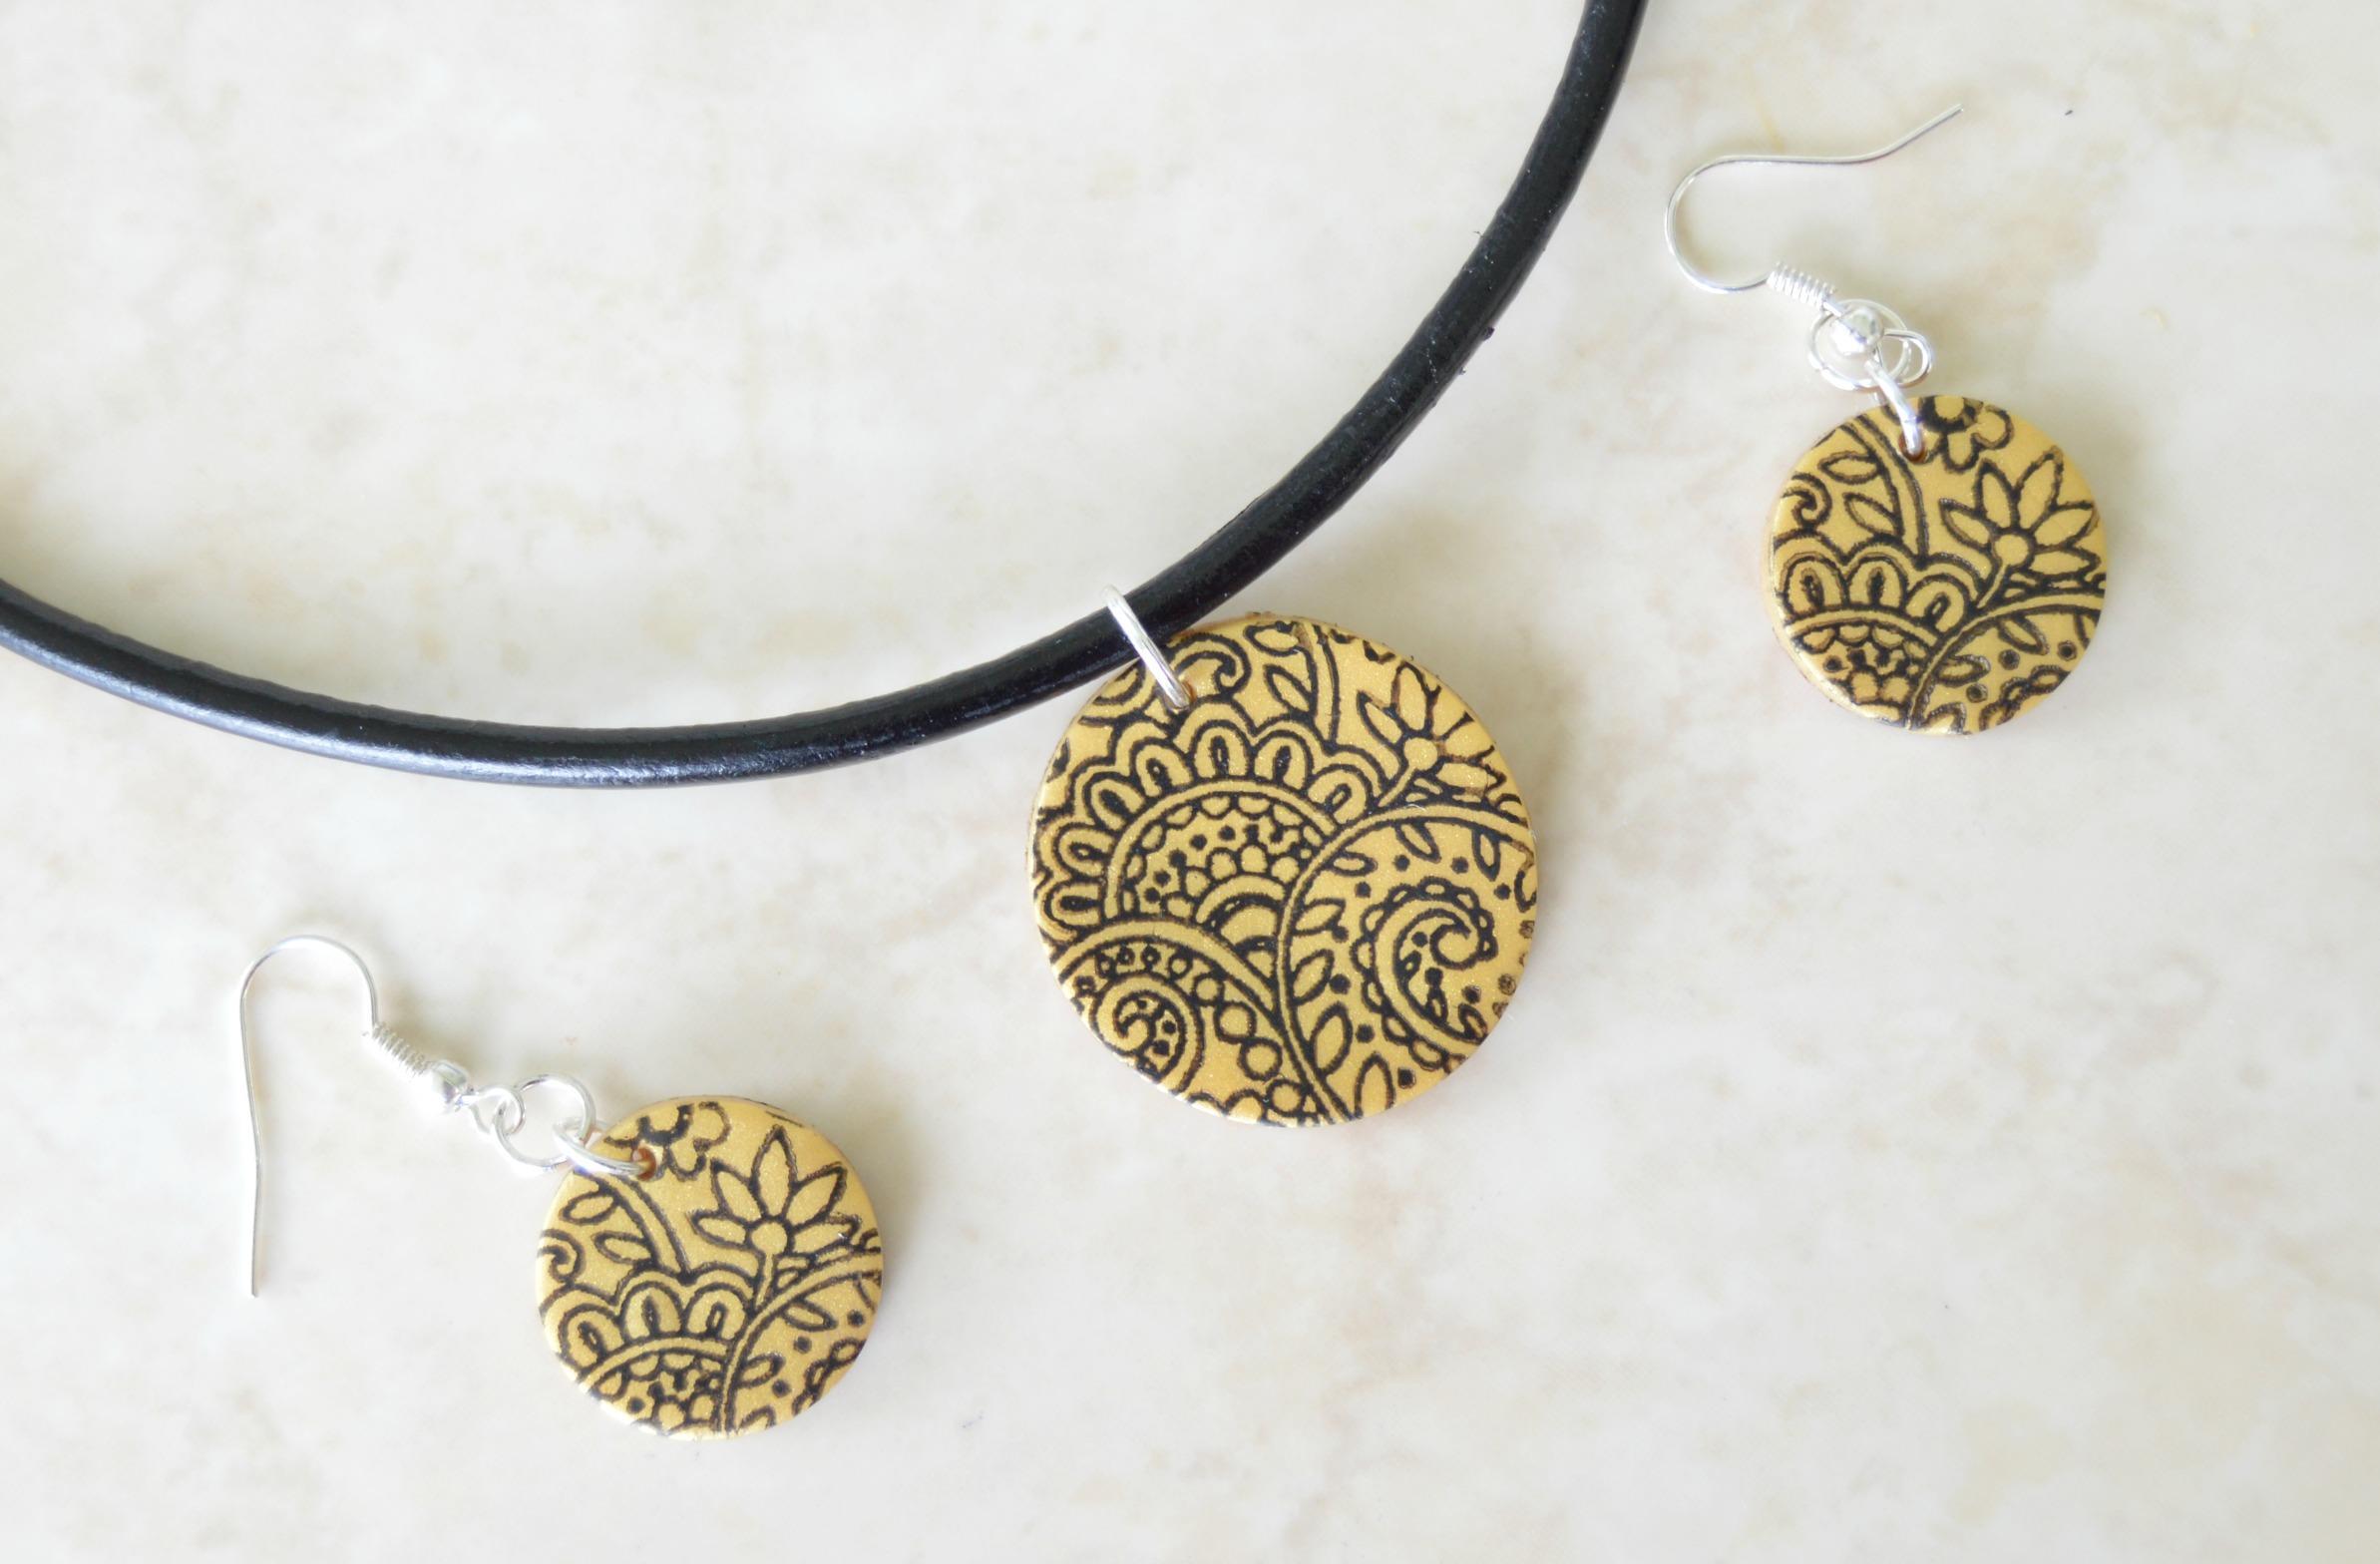 How to make a stamped clay jewelry - DIY jewelry | Sahana Ajeethan ...